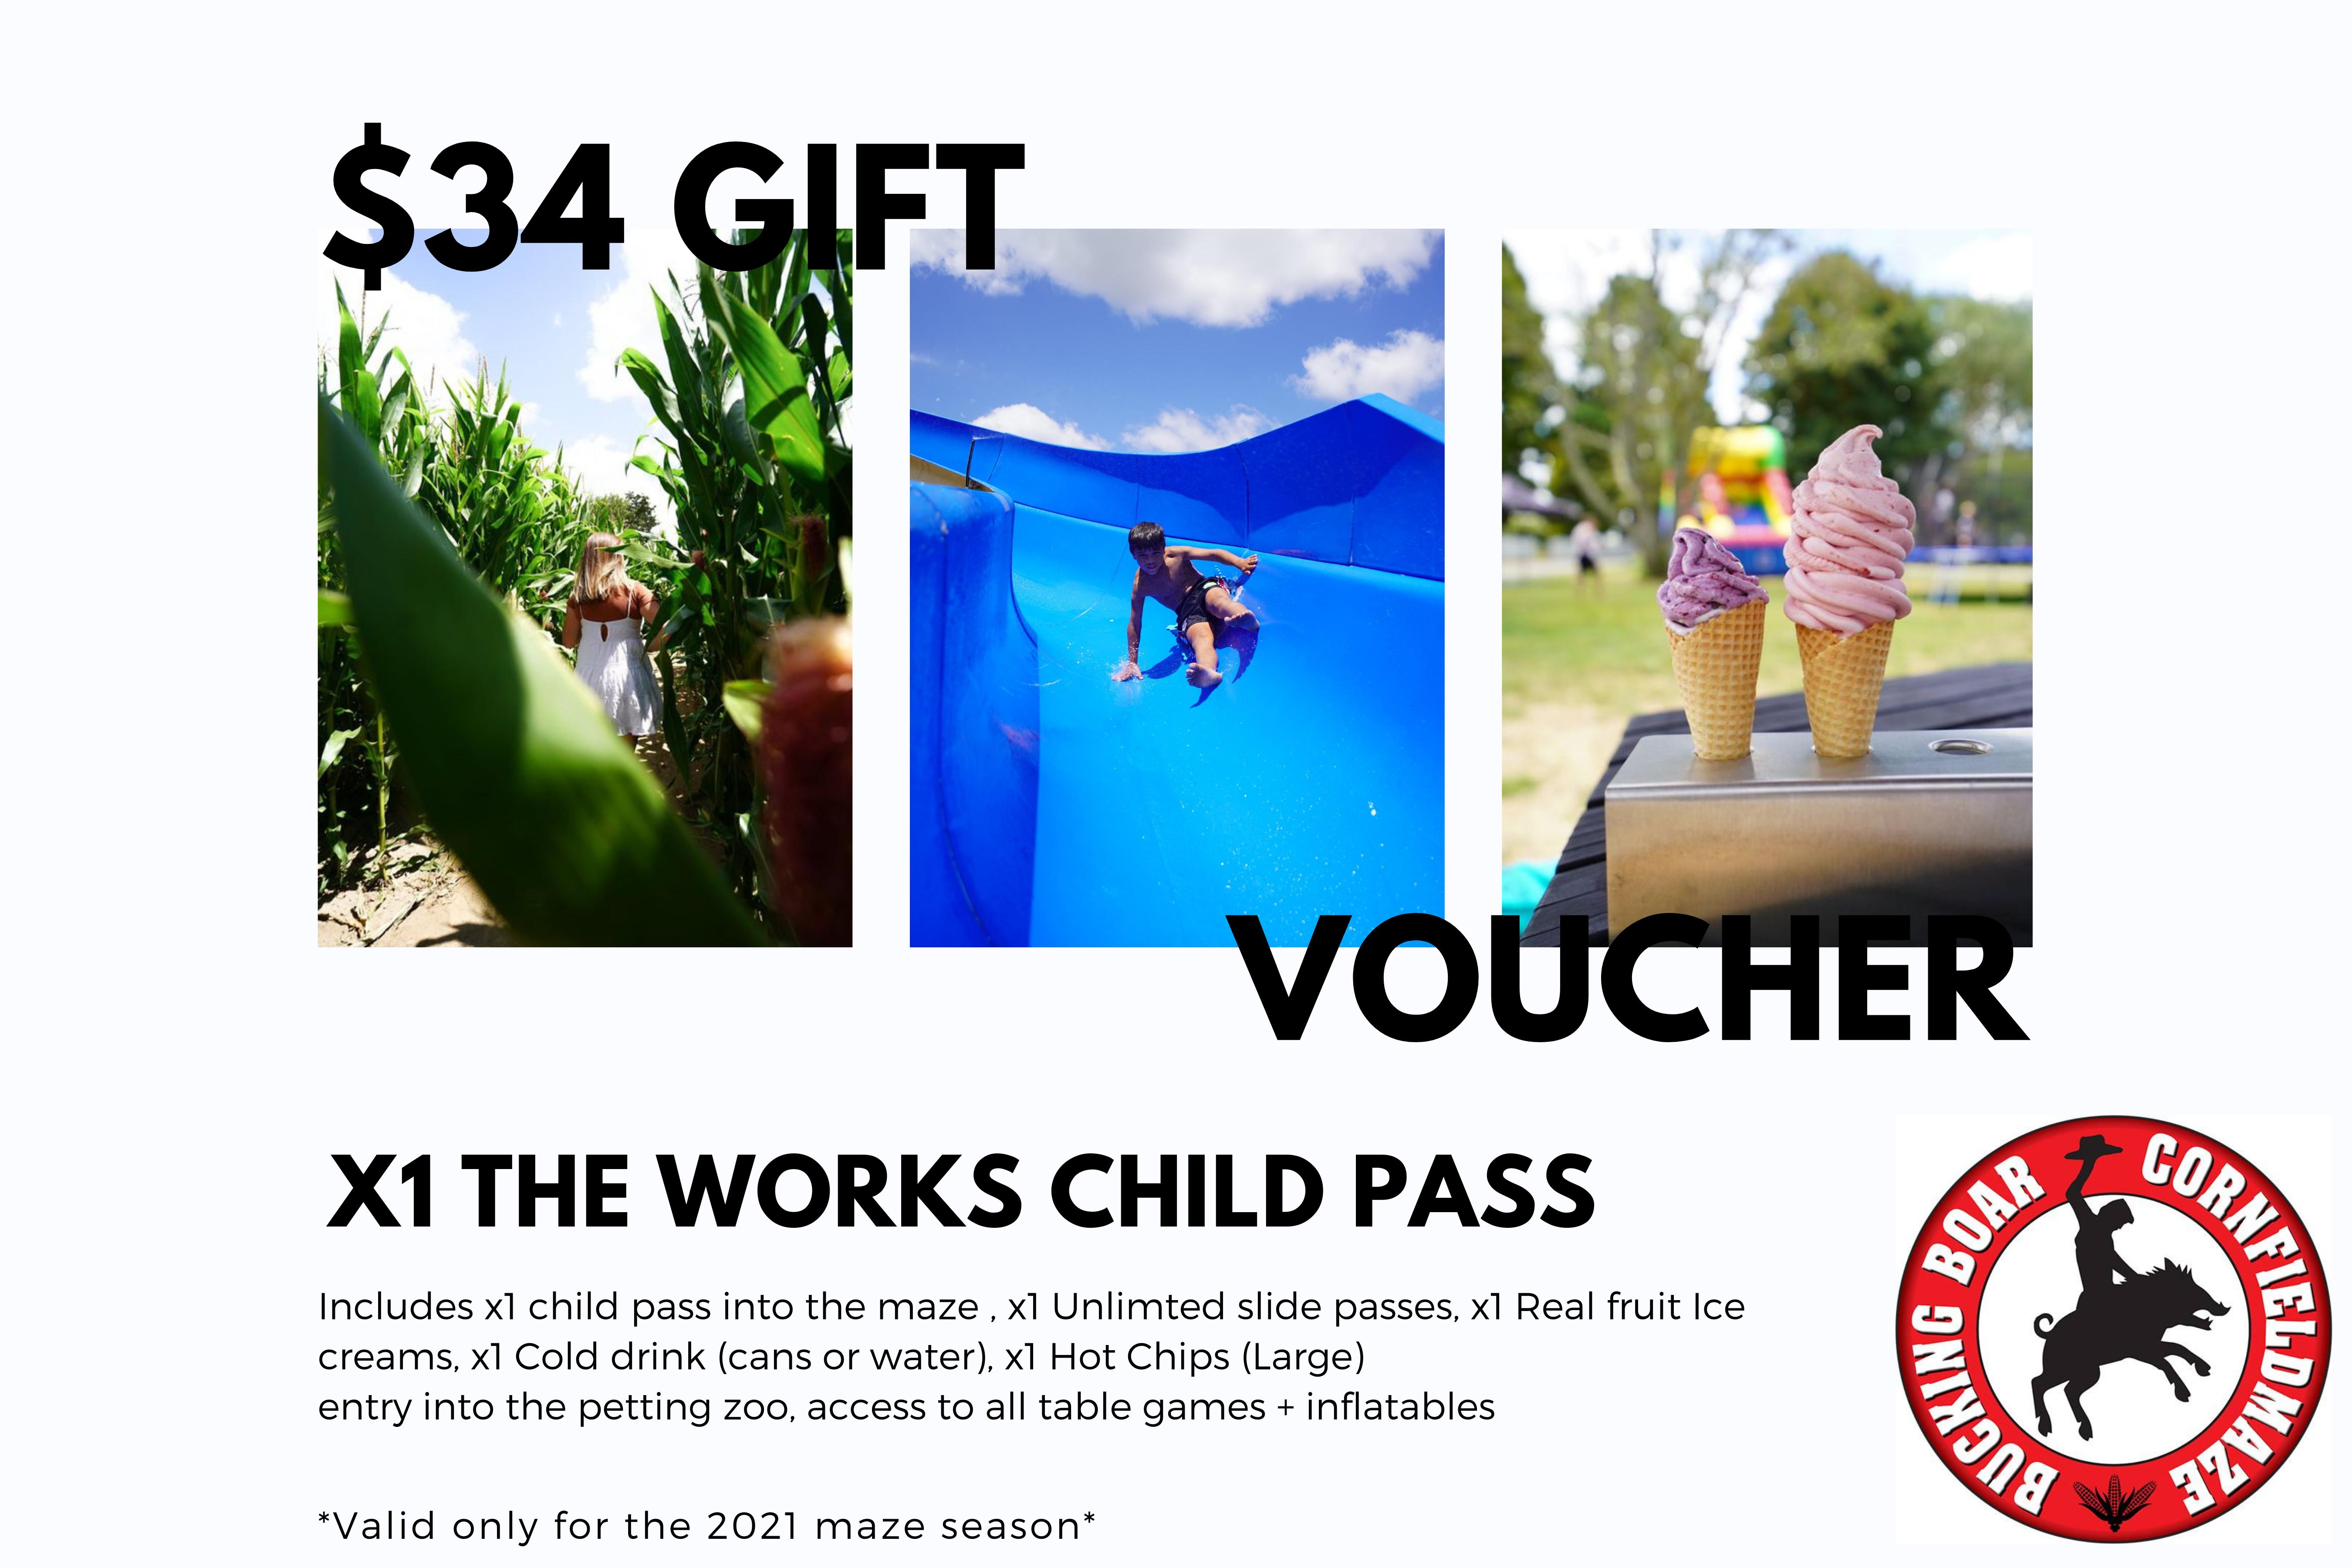 Gift Voucher - The Works Child Pass